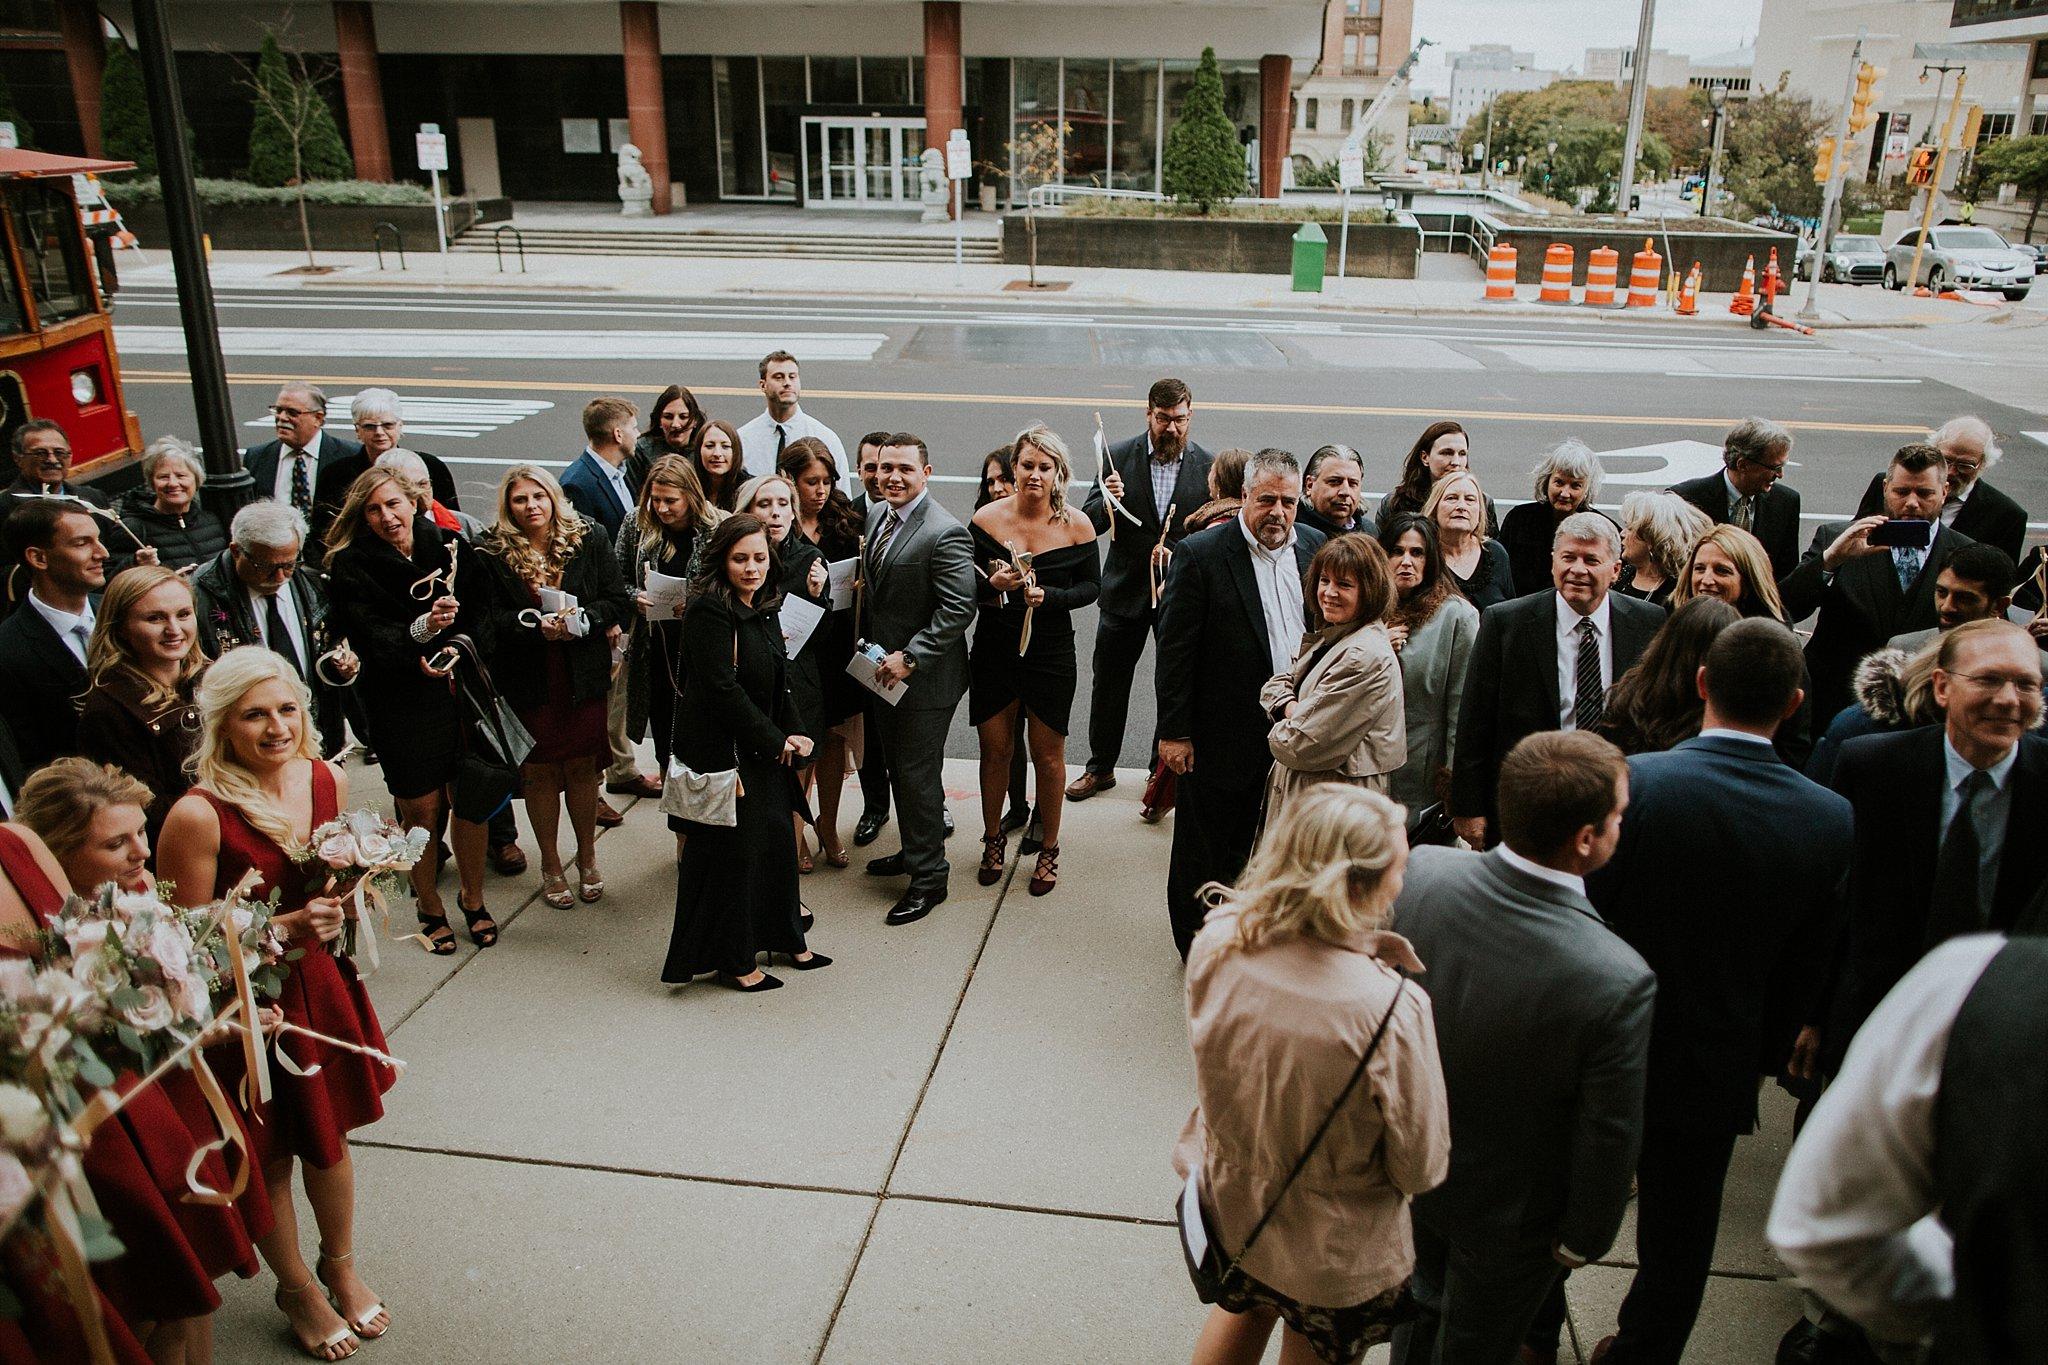 Matt-Lauren_St-Marys_Hilton-City-Center-Milwaukee-Wedding_liller-photo_0029.jpg